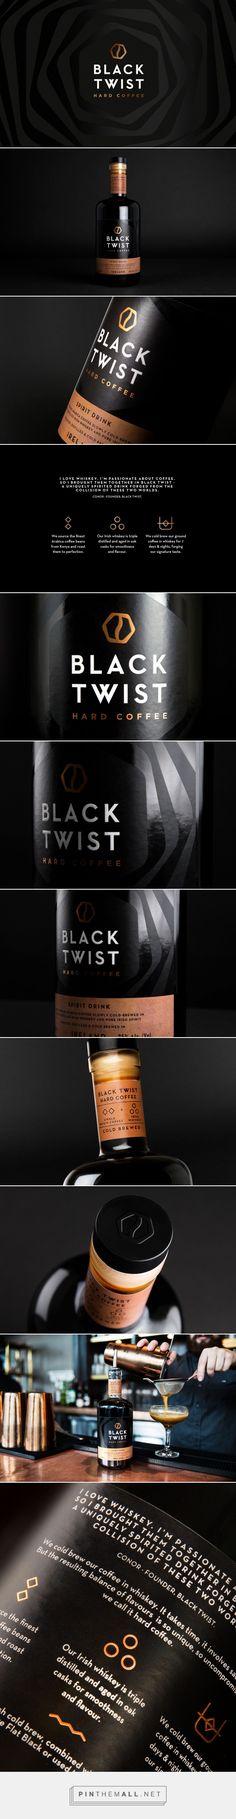 Black Twist Hard Coffee + Whisky packaging design by Robot Food - http://www.packagingoftheworld.com/2017/09/black-twist.html